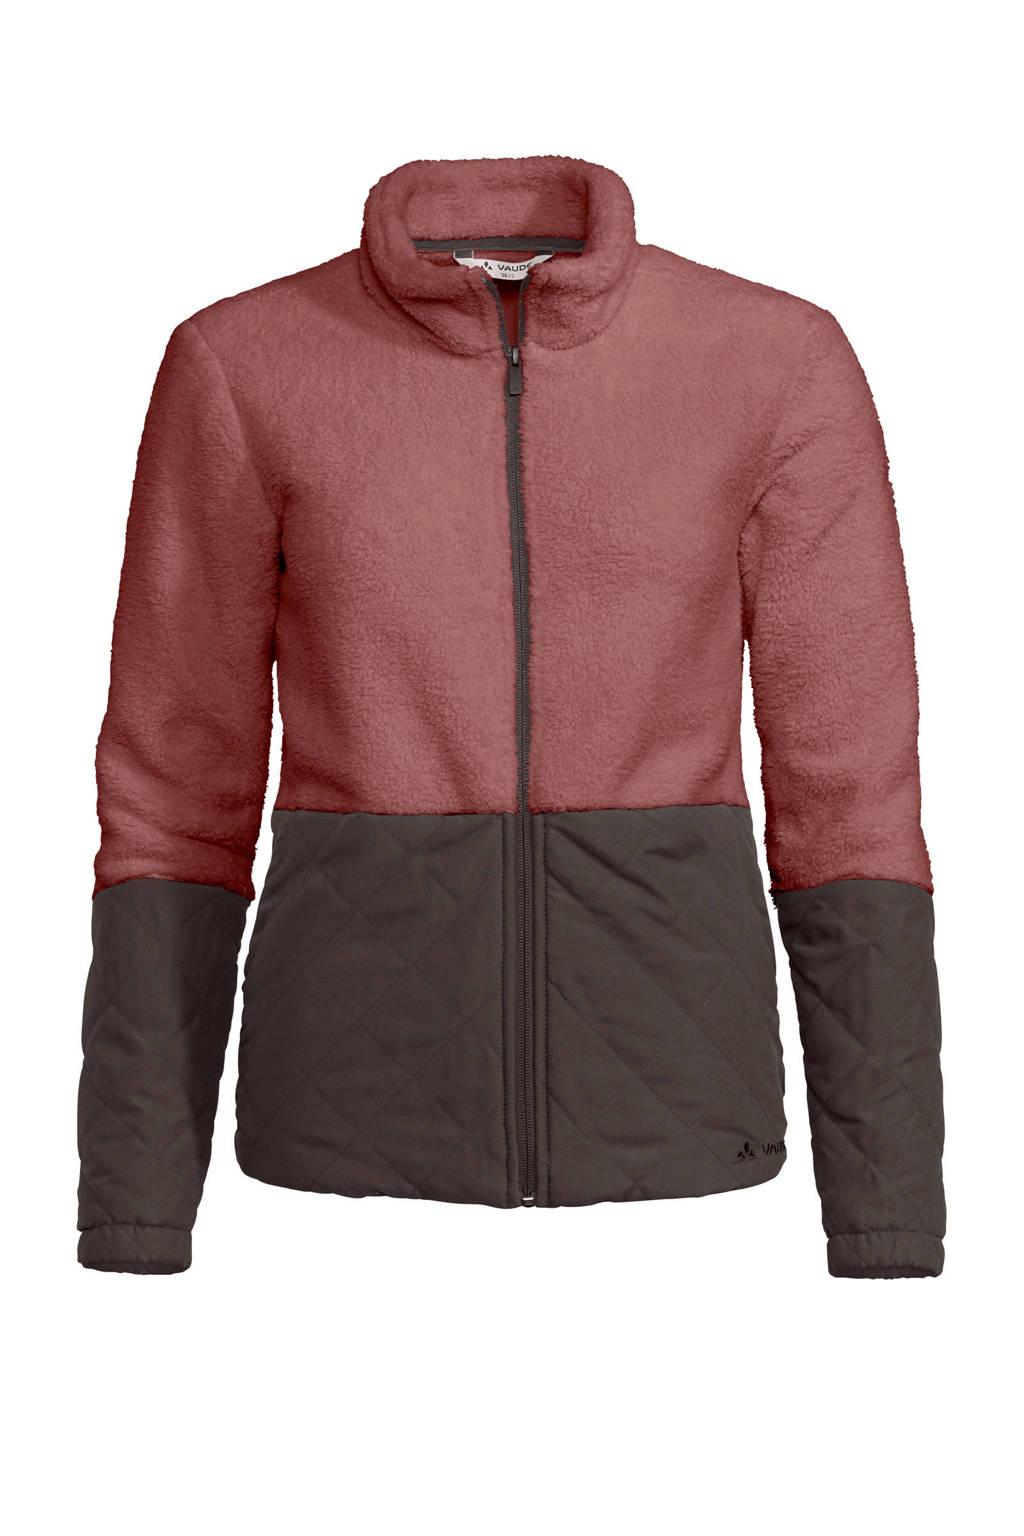 Vaude fleece vest Manukau rood/donkerbruin, Dusty-Rose